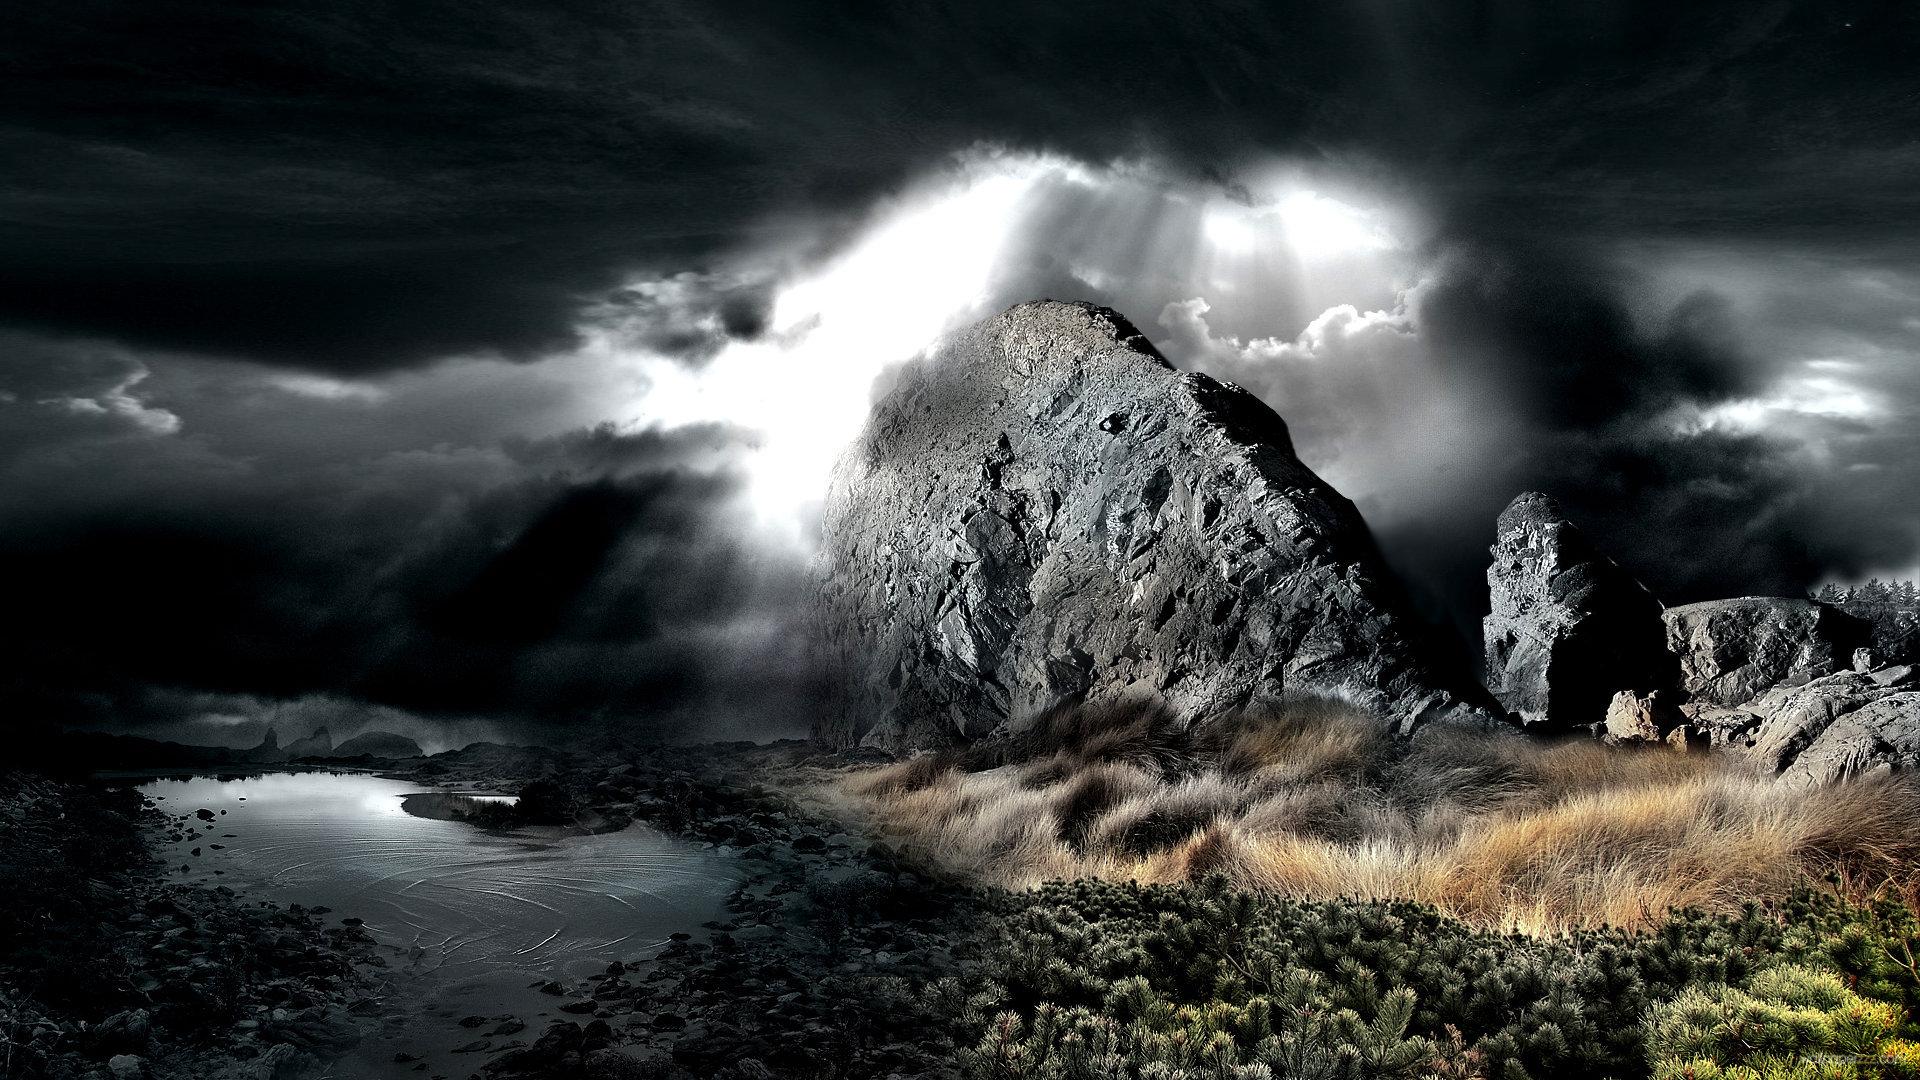 dark nature hd wallpaper collection hd desktop 10 by